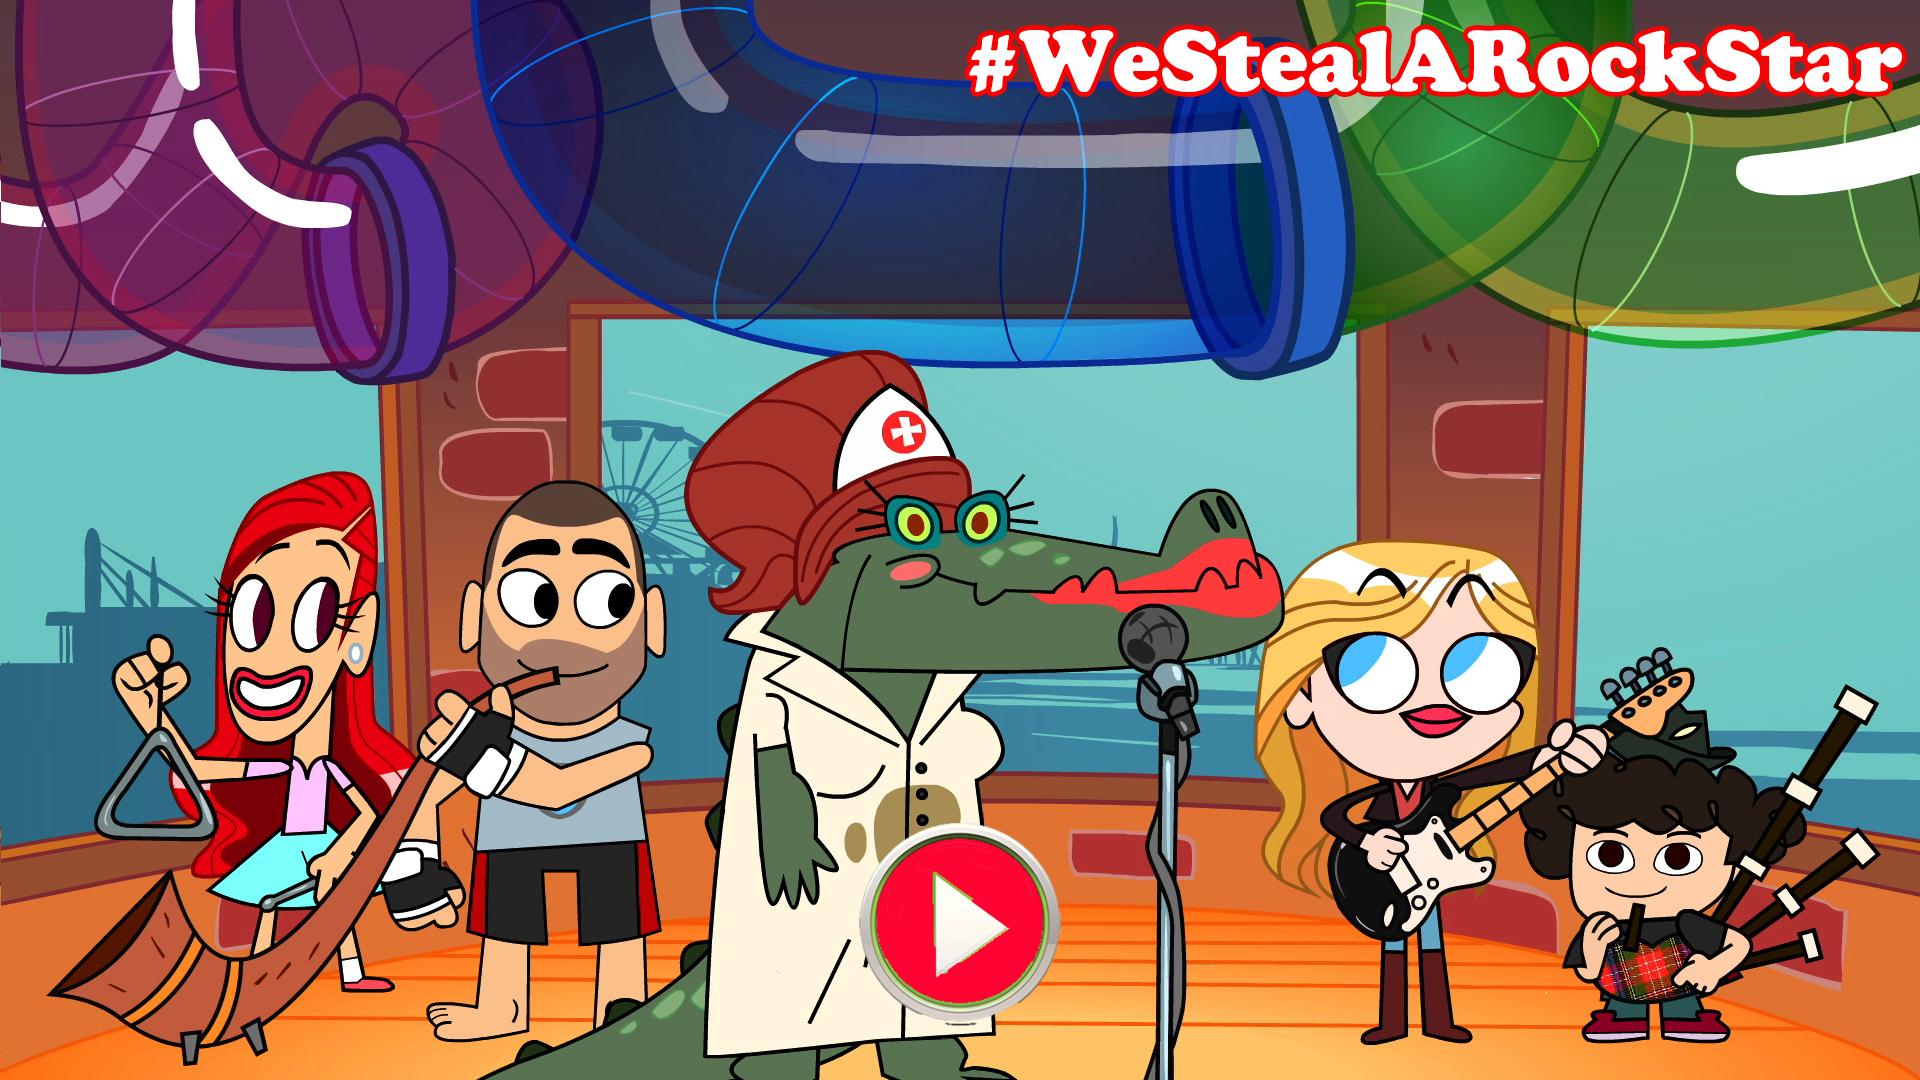 #WeStealARockStar